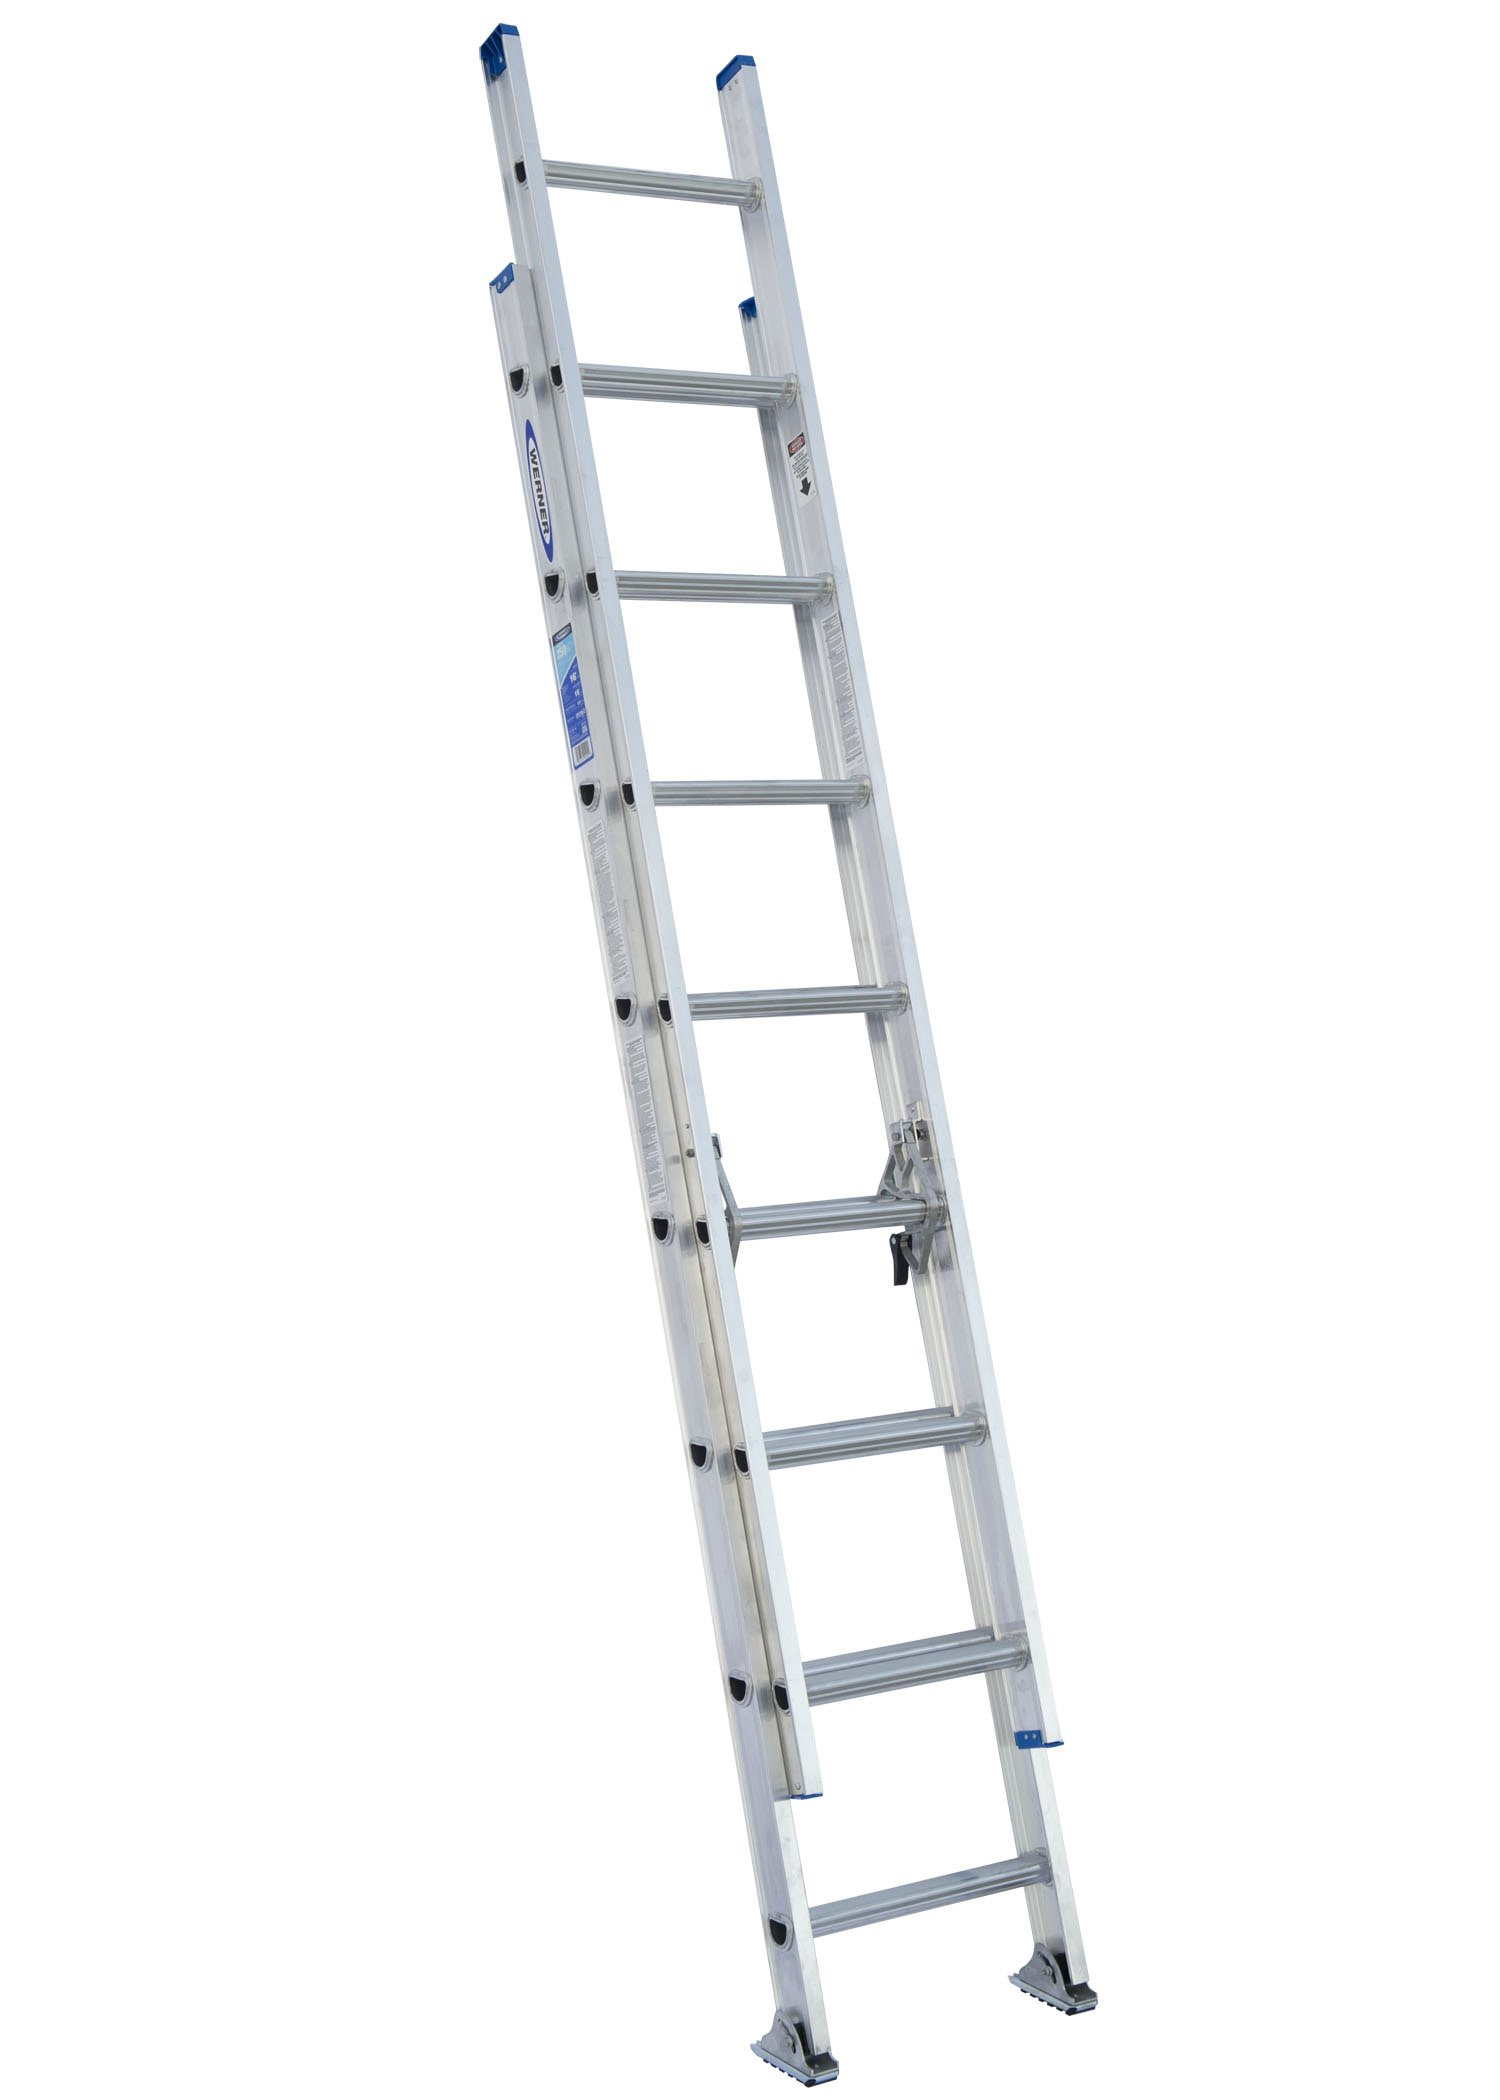 Werner D1316-2 250-Pound Duty Rating Aluminum Flat D-Rung Extension Ladder, 16-Foot